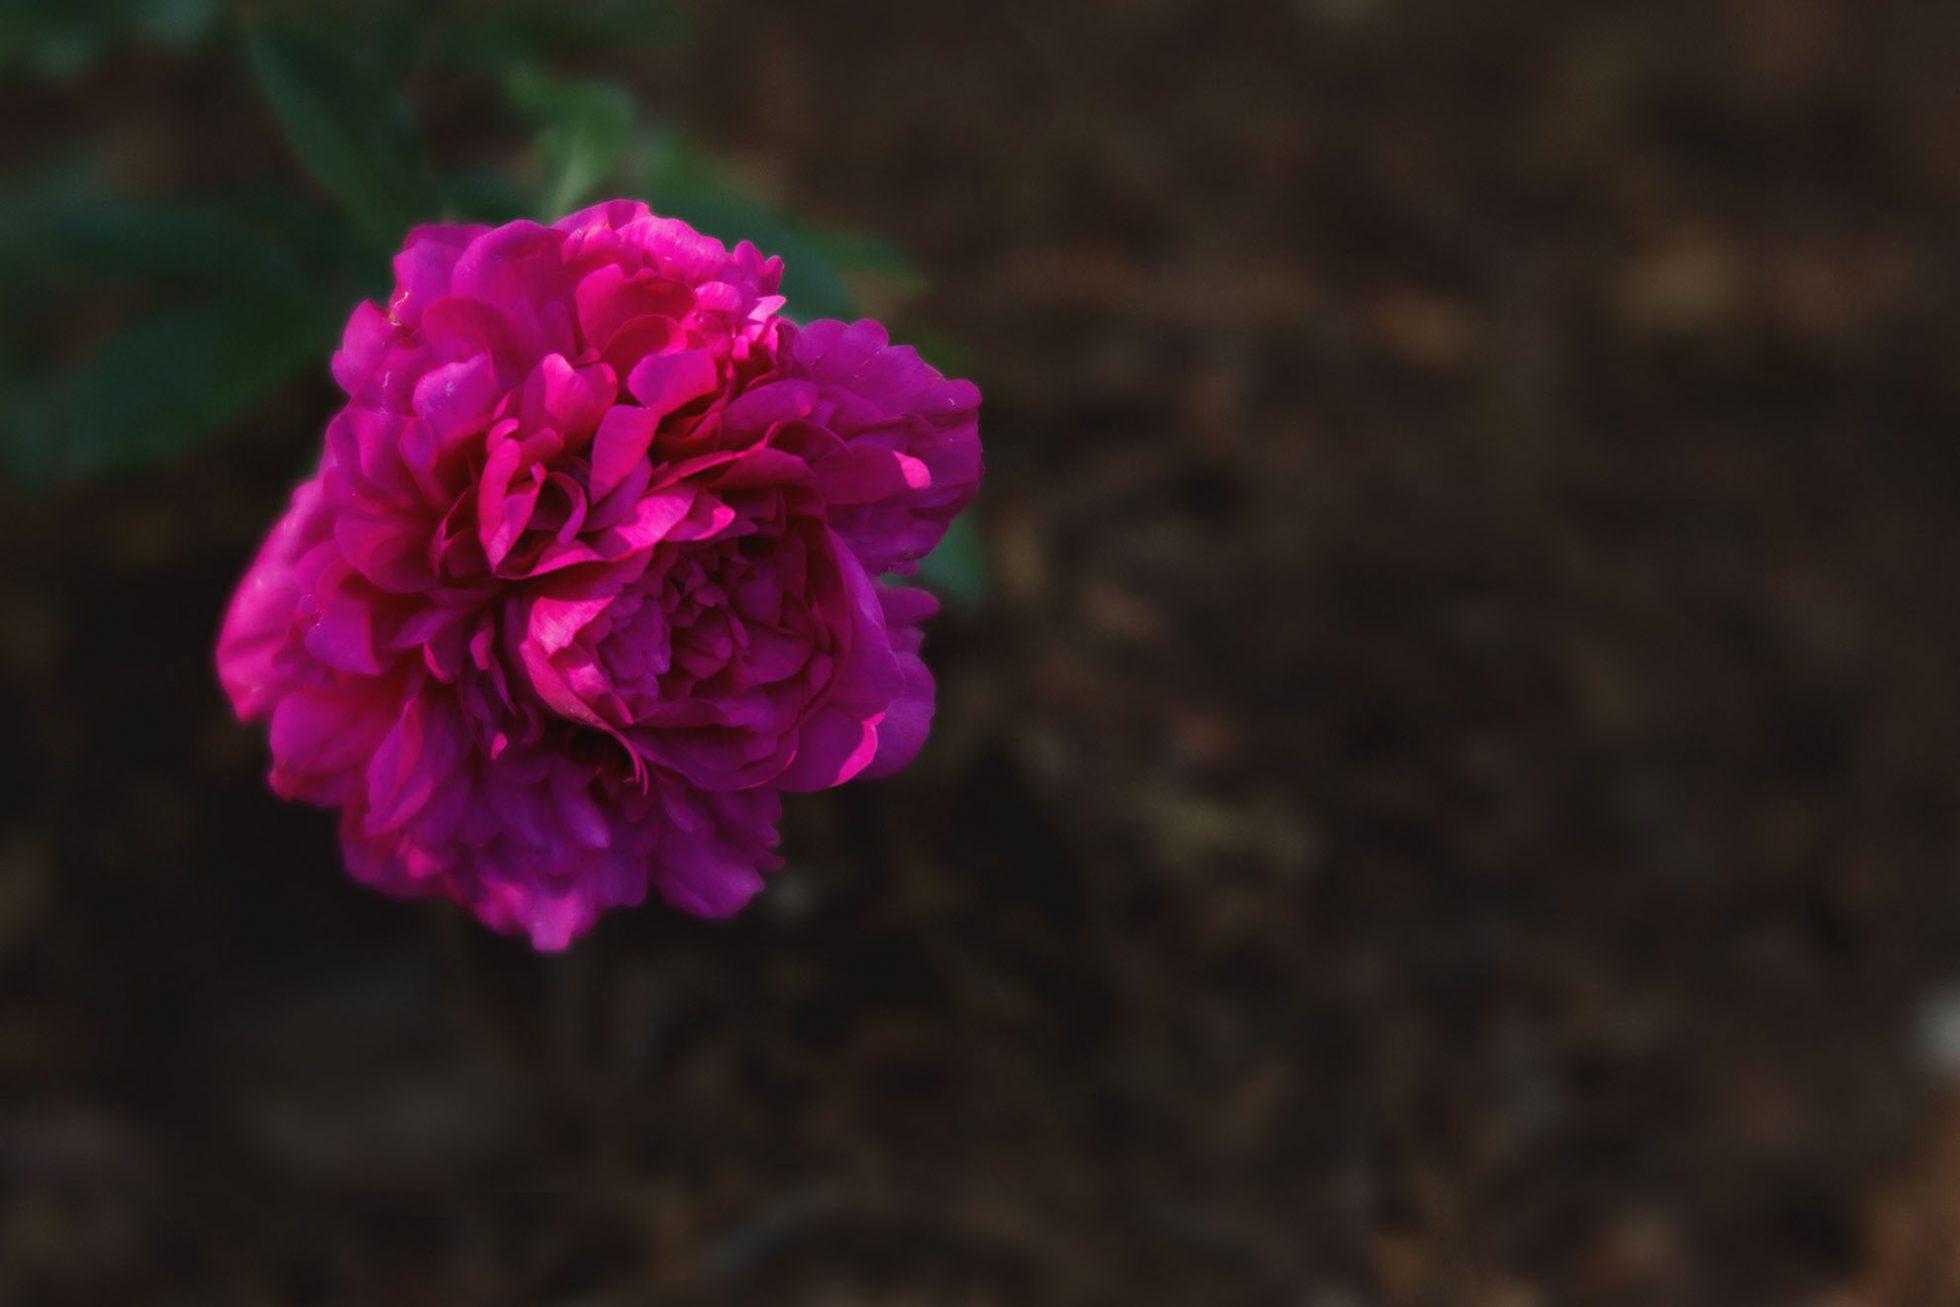 magenta flower - nature photography